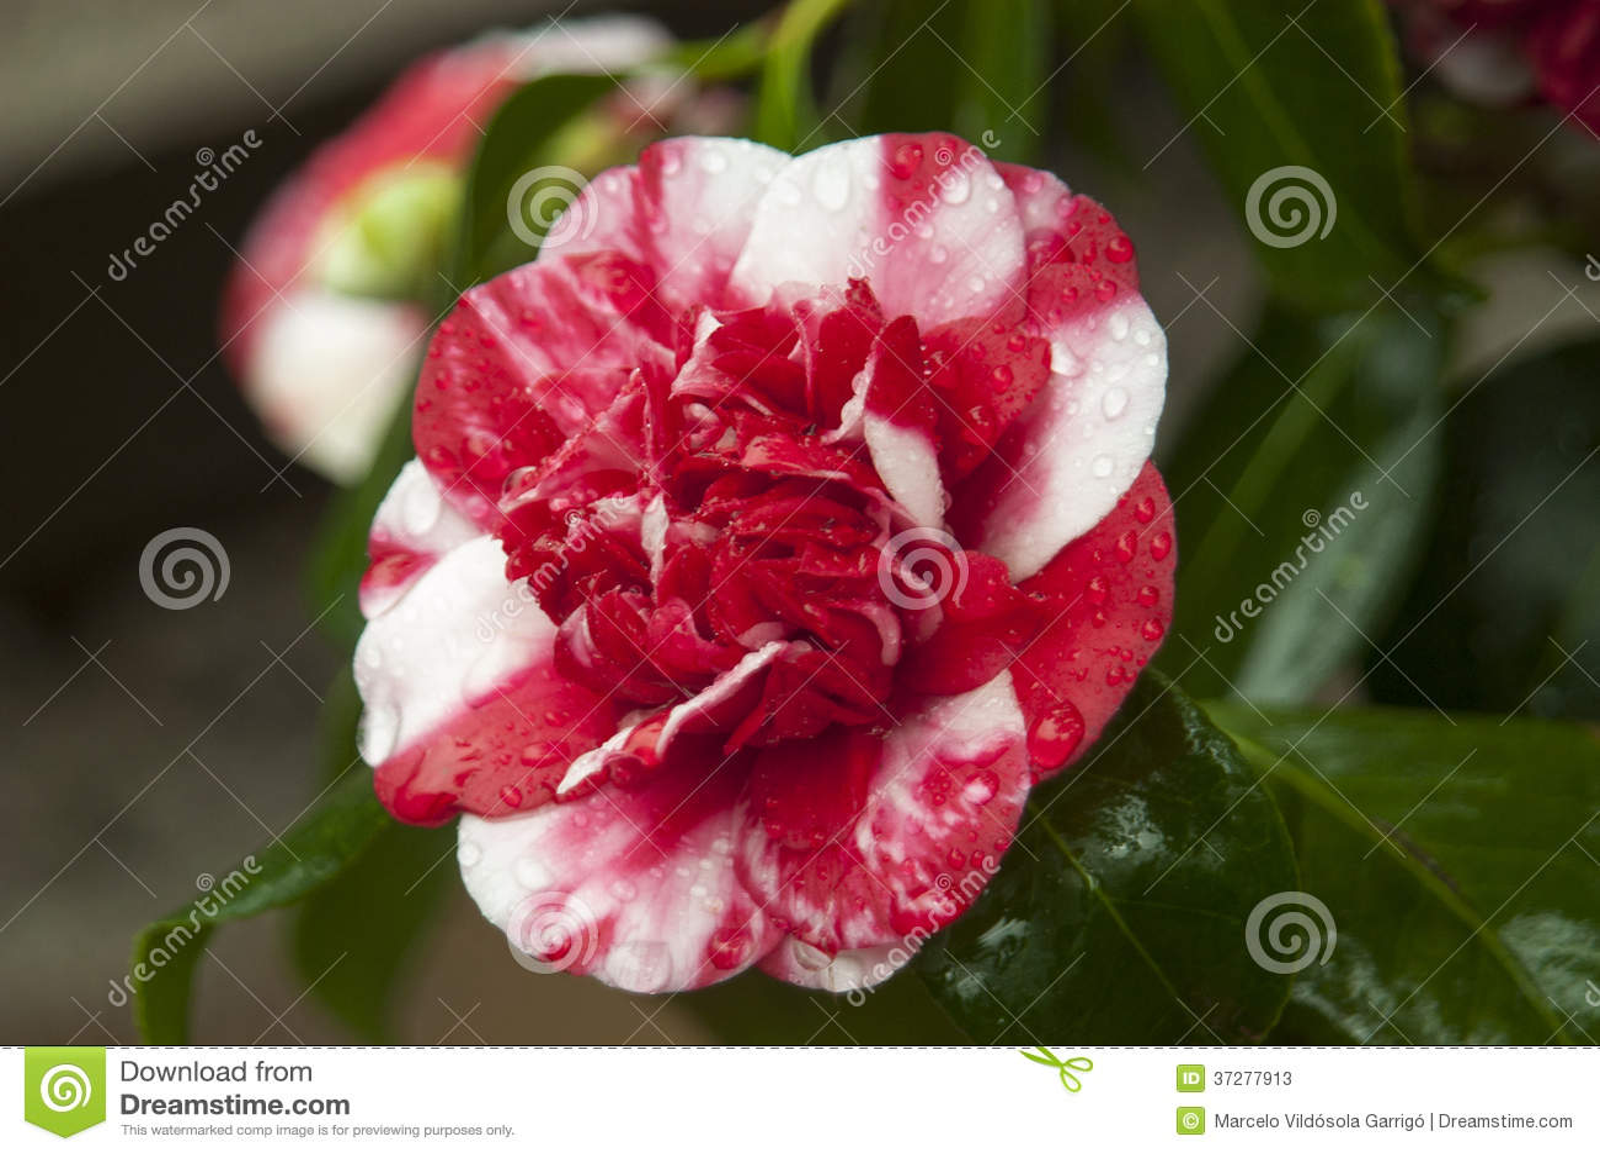 Variegated camellia stock image image of camellia fresh - Camelia fotos ...